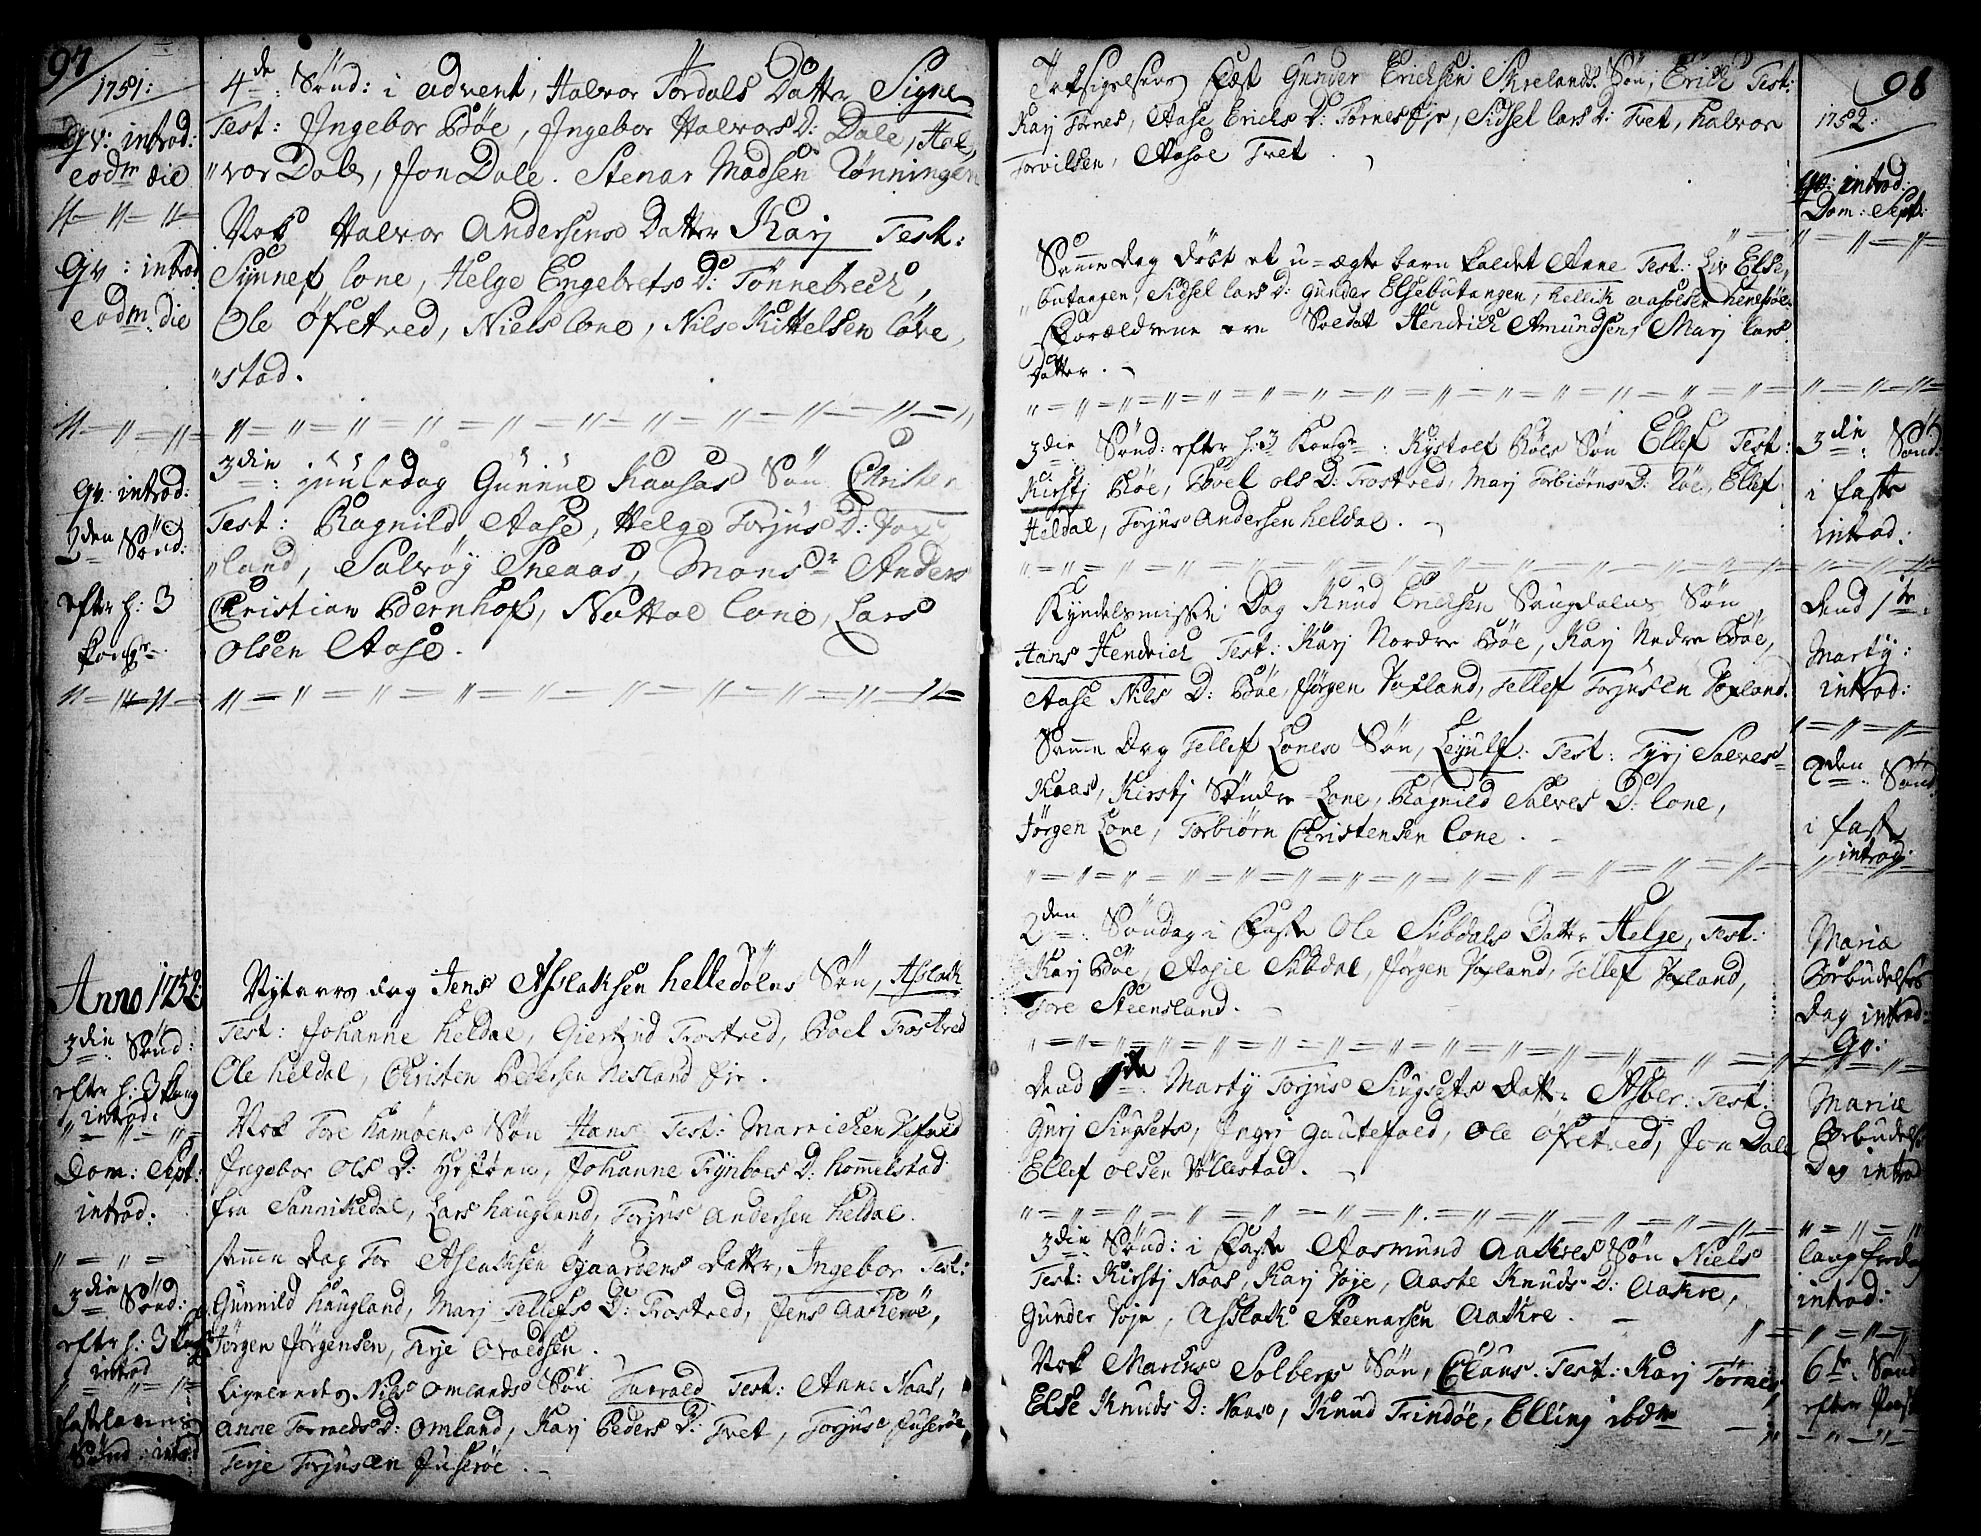 SAKO, Drangedal kirkebøker, F/Fa/L0002: Ministerialbok nr. 2, 1733-1753, s. 97-98